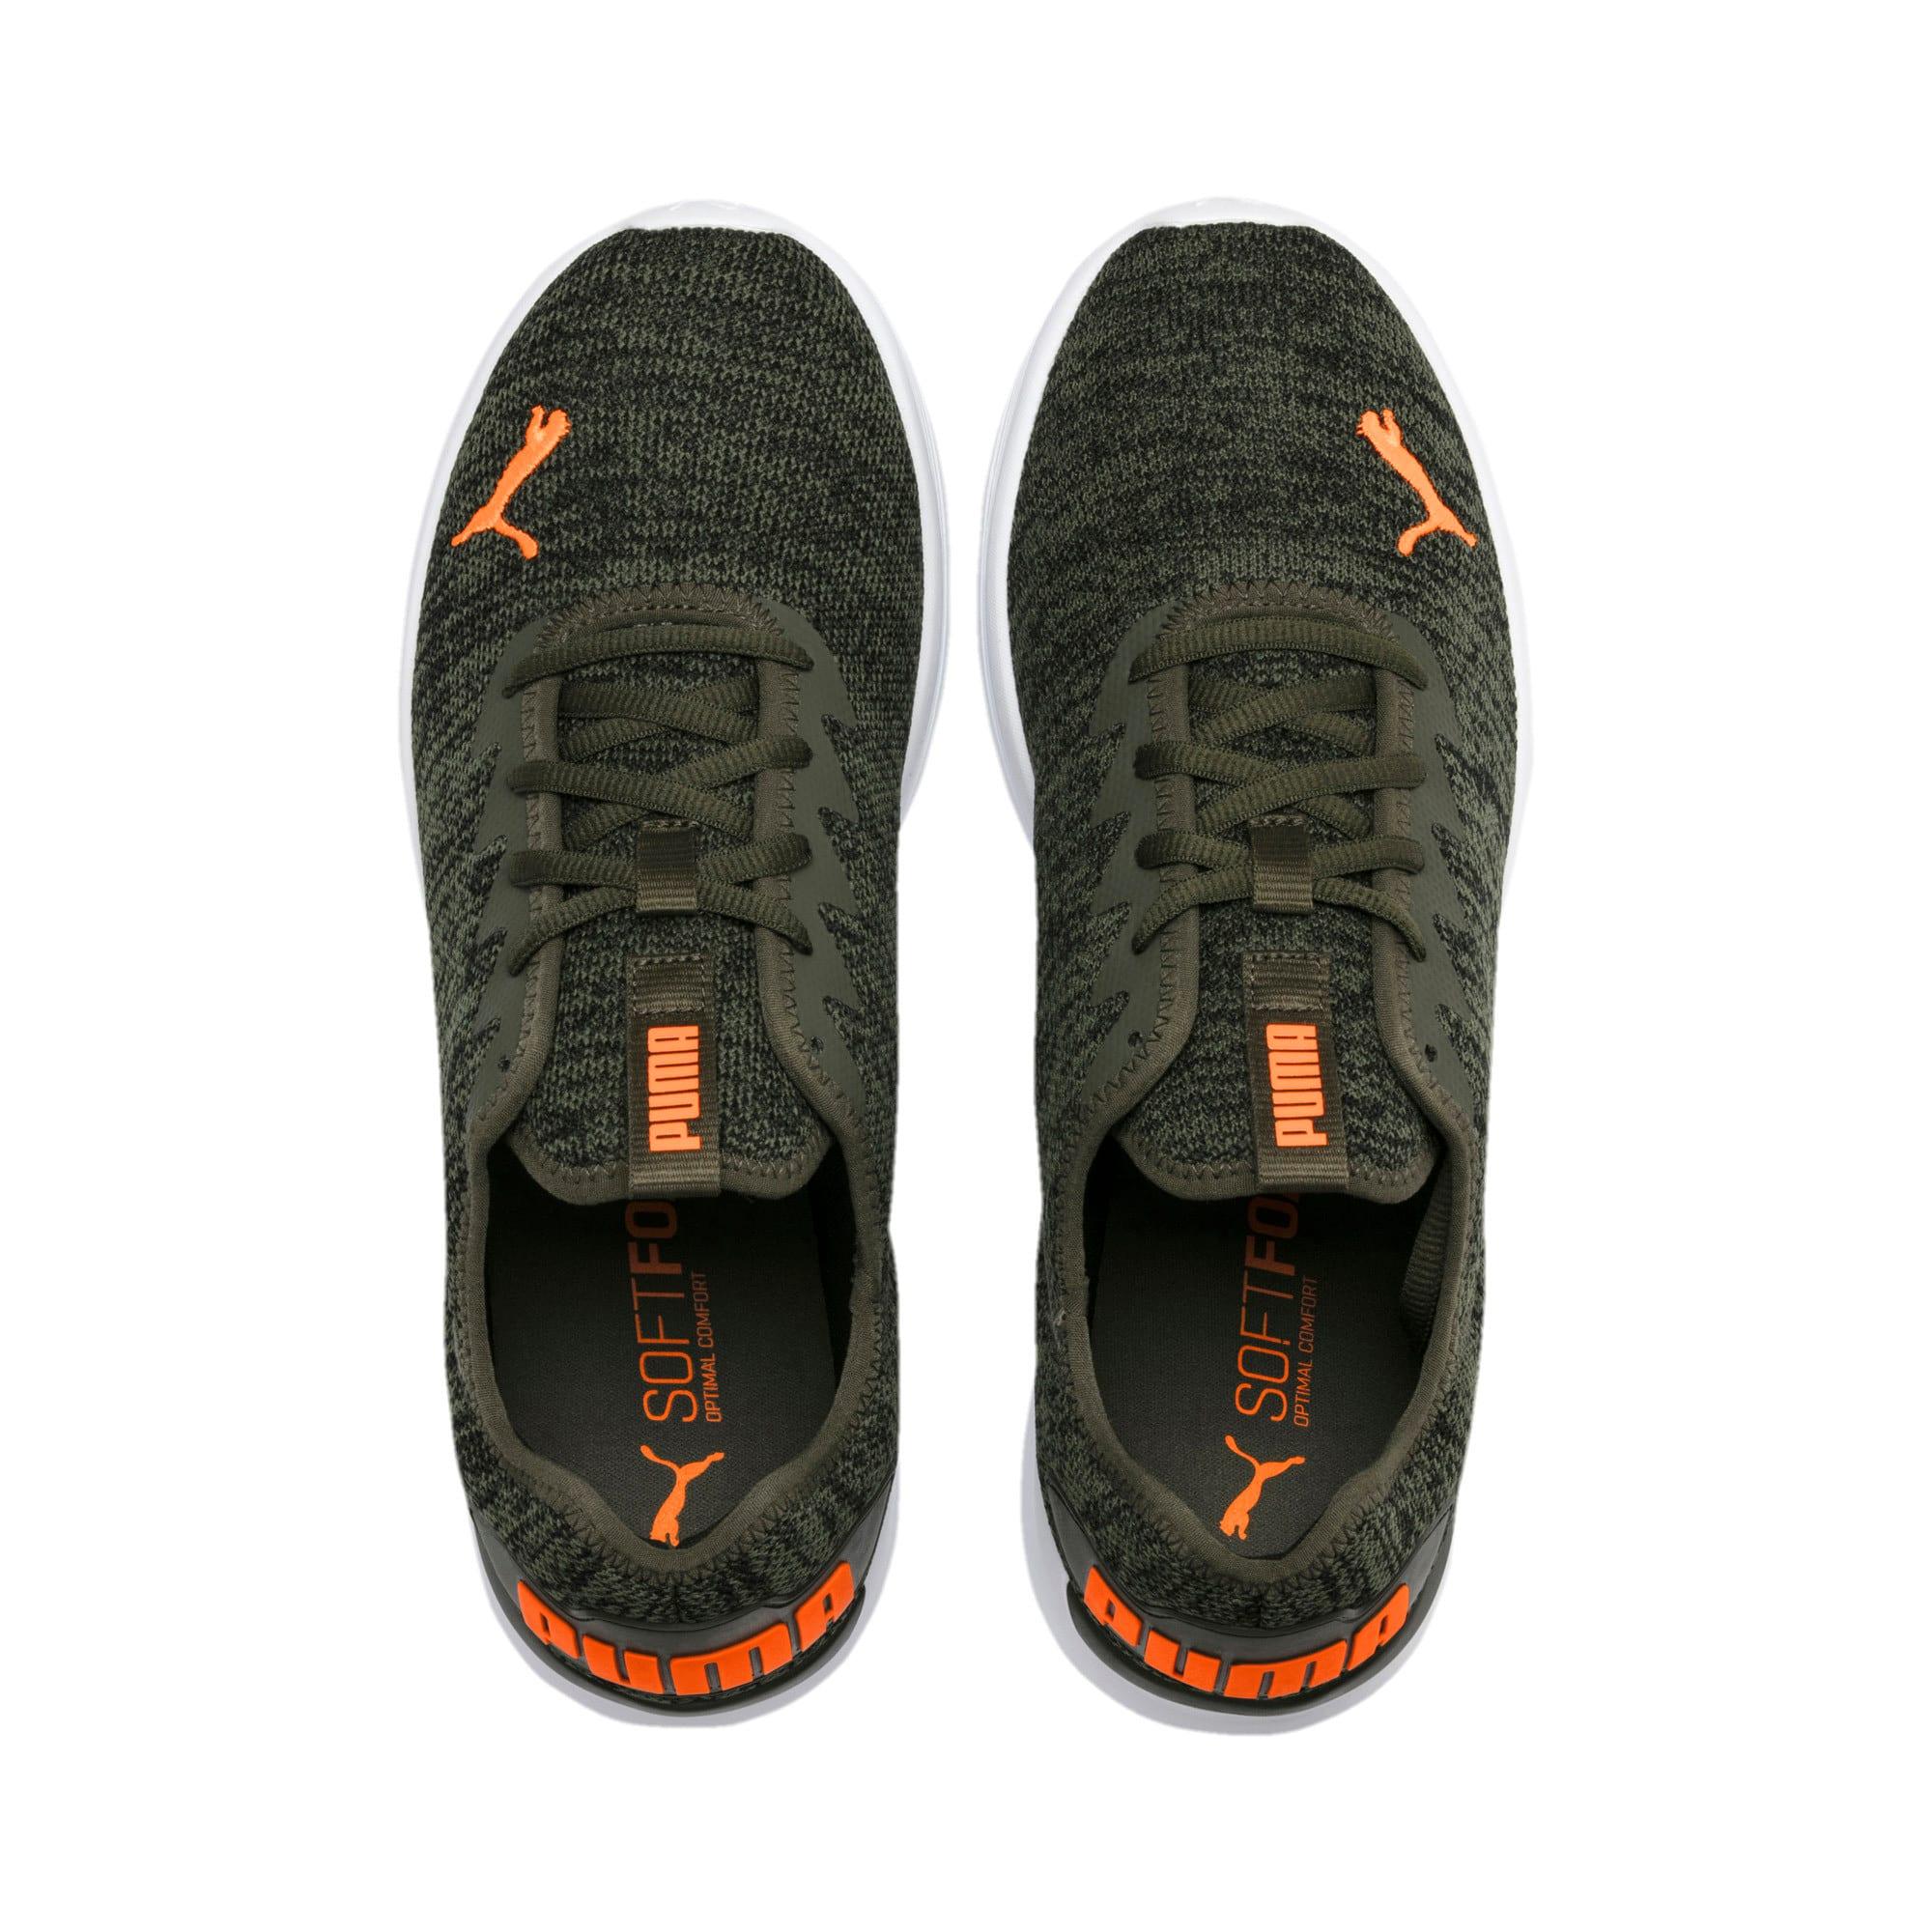 Thumbnail 8 of Ballast Men's Running Shoes, Forest Night-Black-Orange, medium-IND